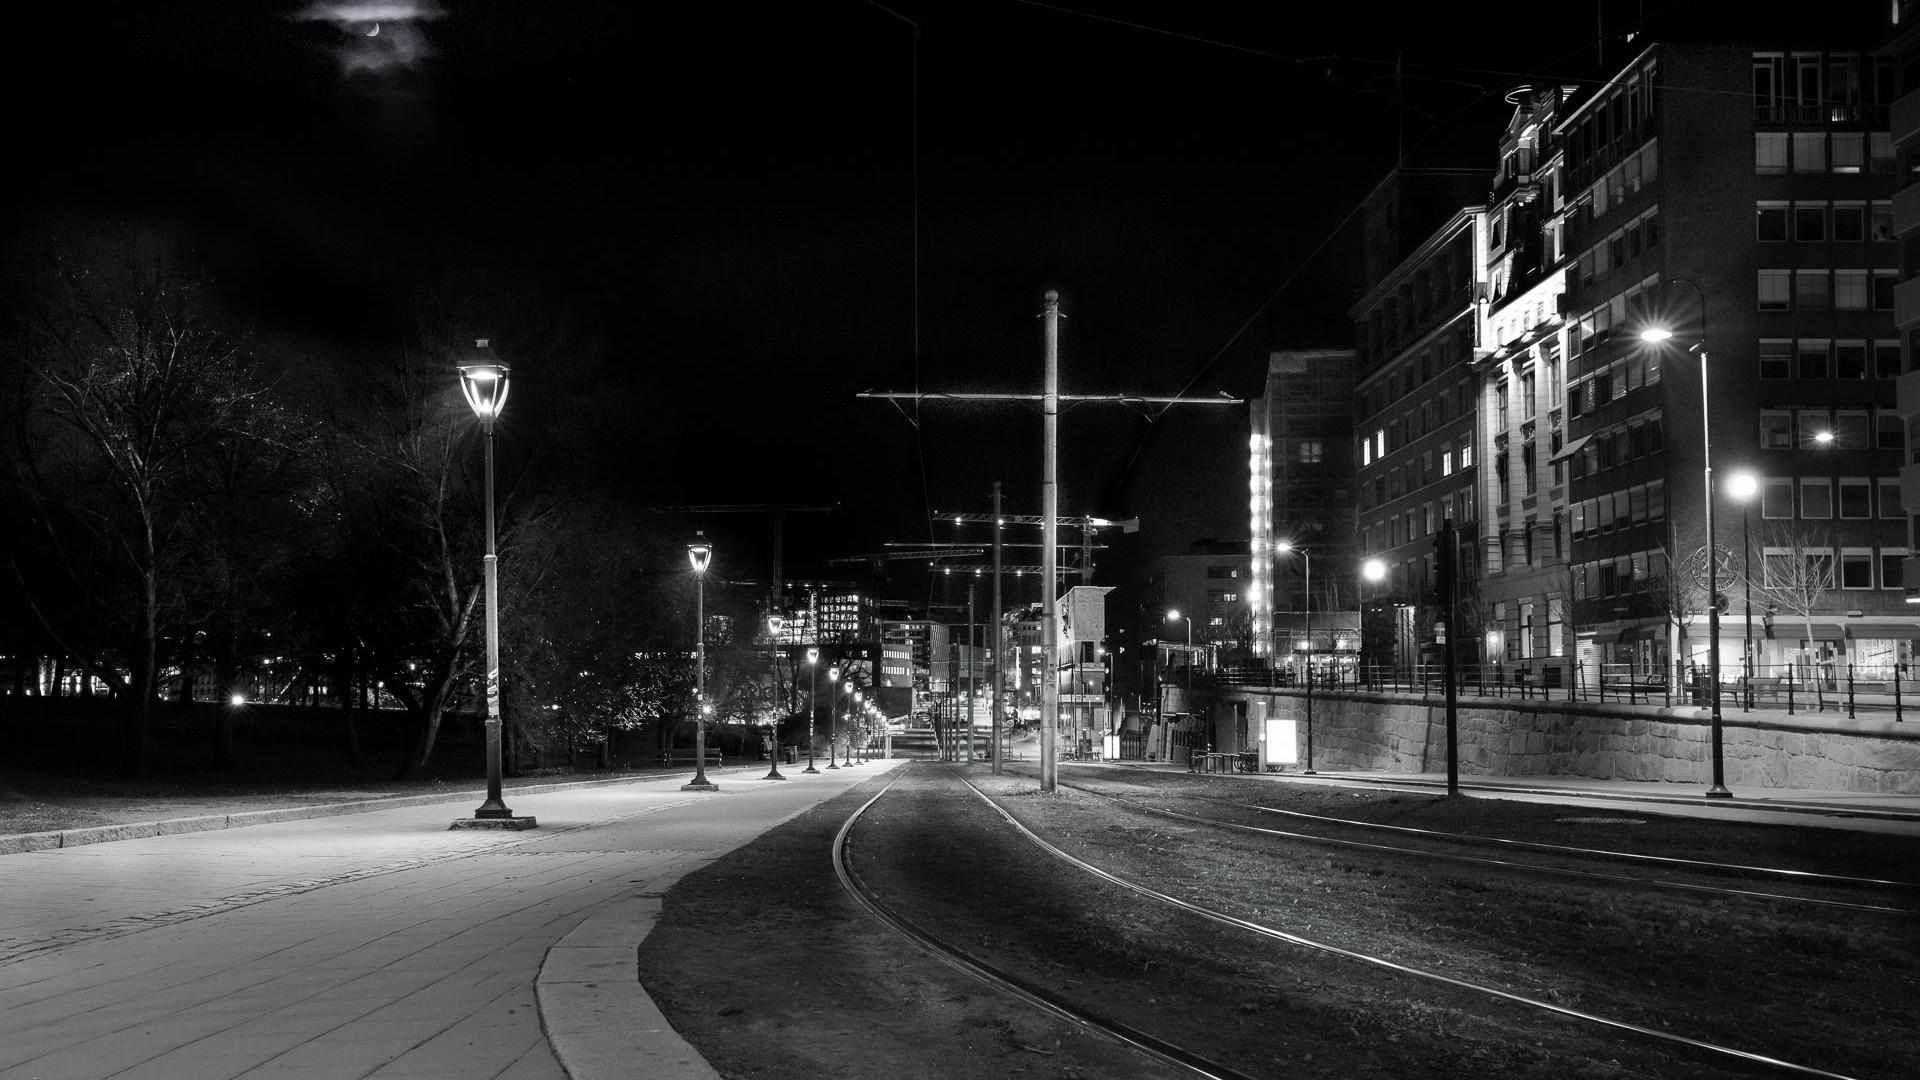 Oslo by night #1